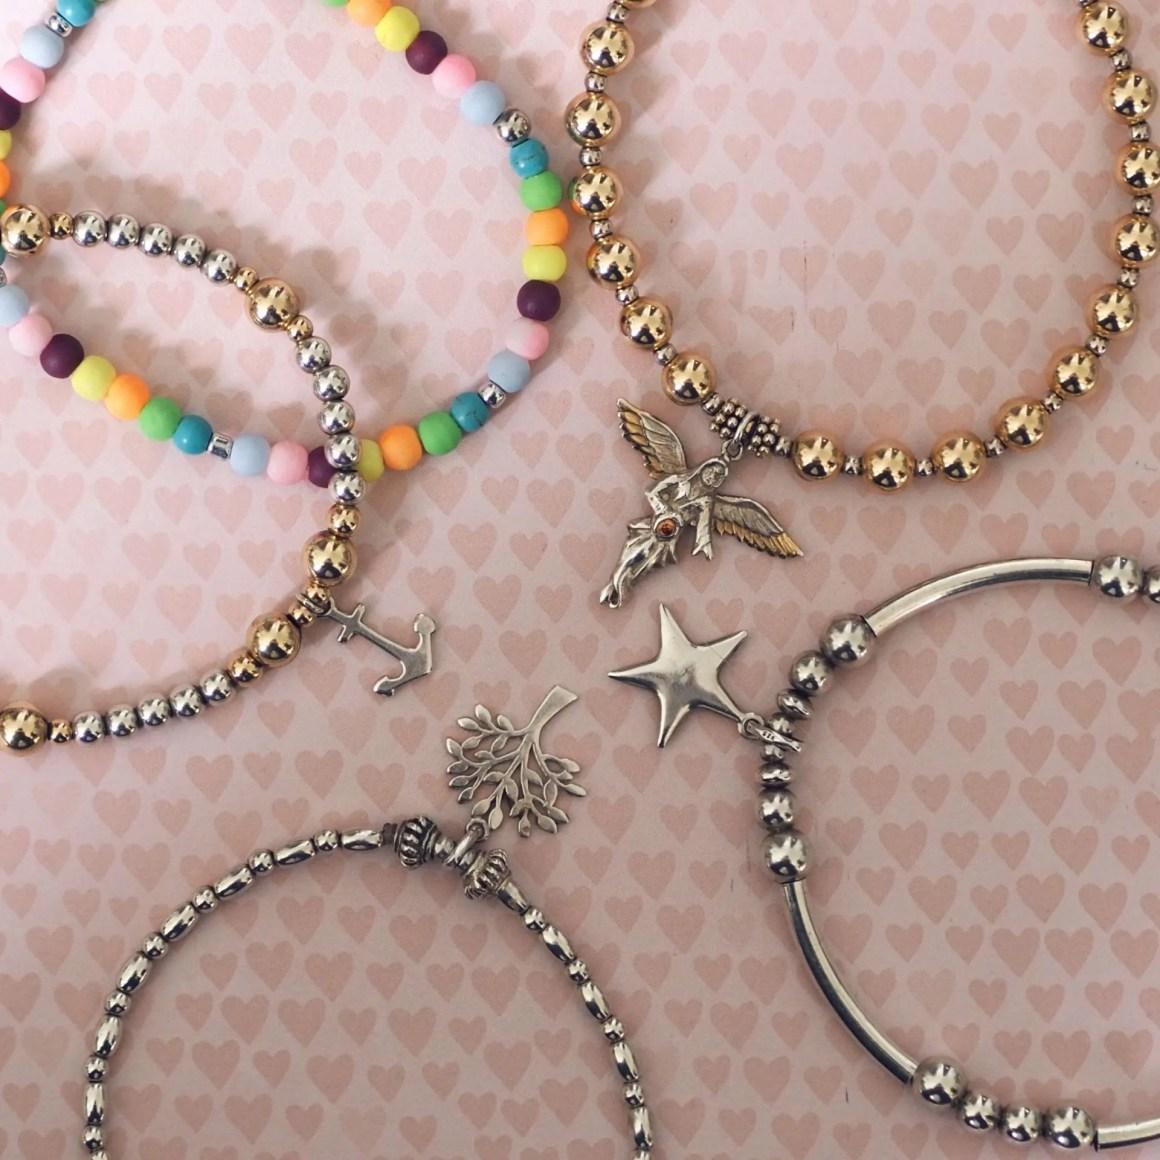 NHS rainbow bracelet